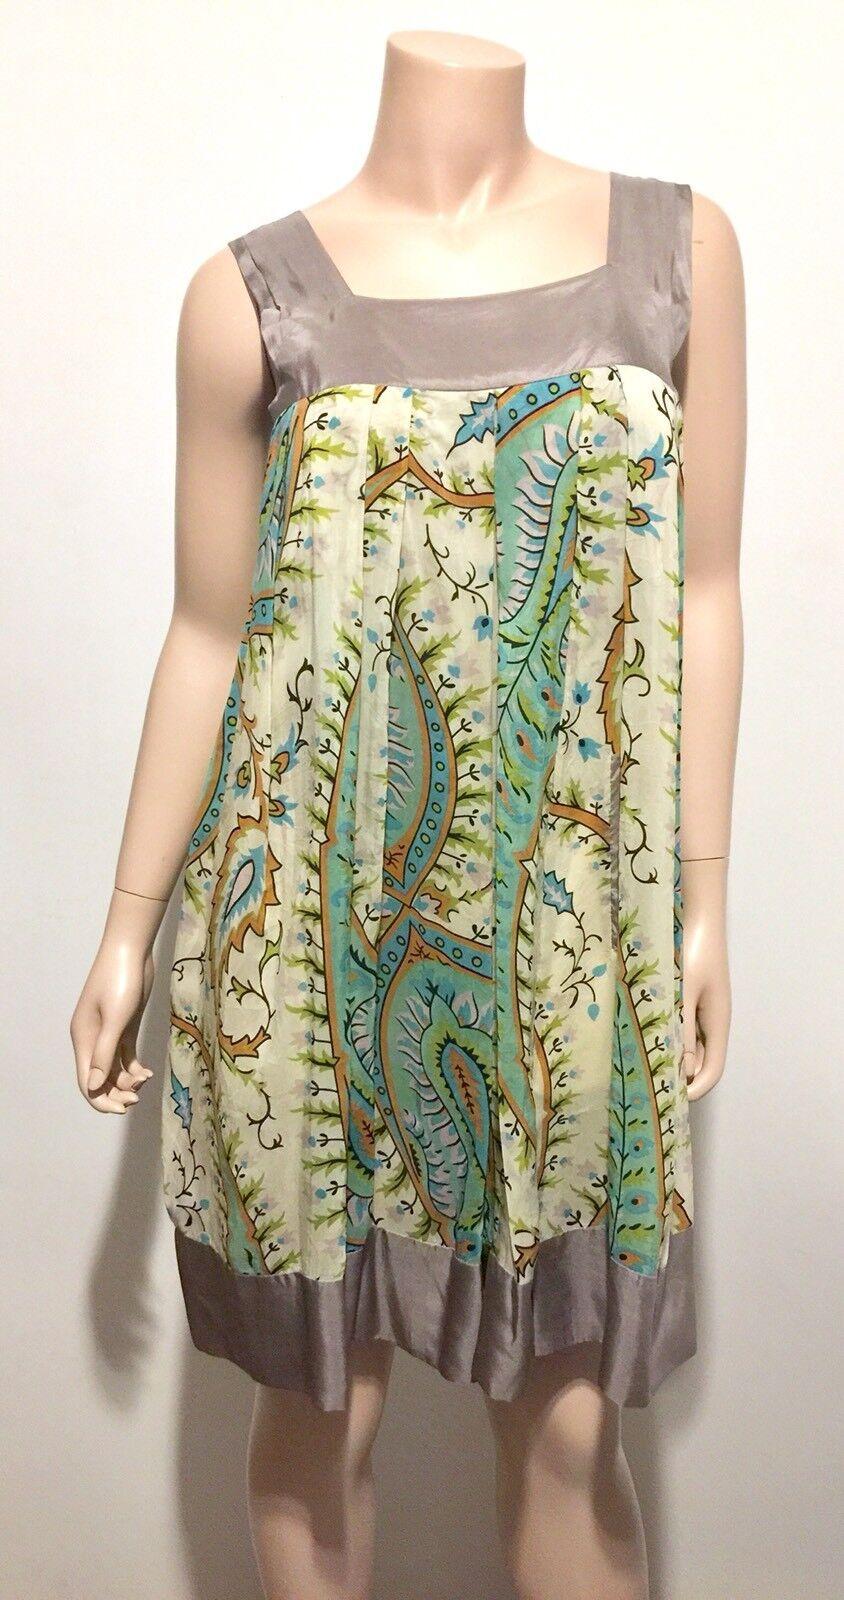 Johnny Was Sleeveless Floral Silk Dress Grün Blau Tan Summer Größe XS EUC